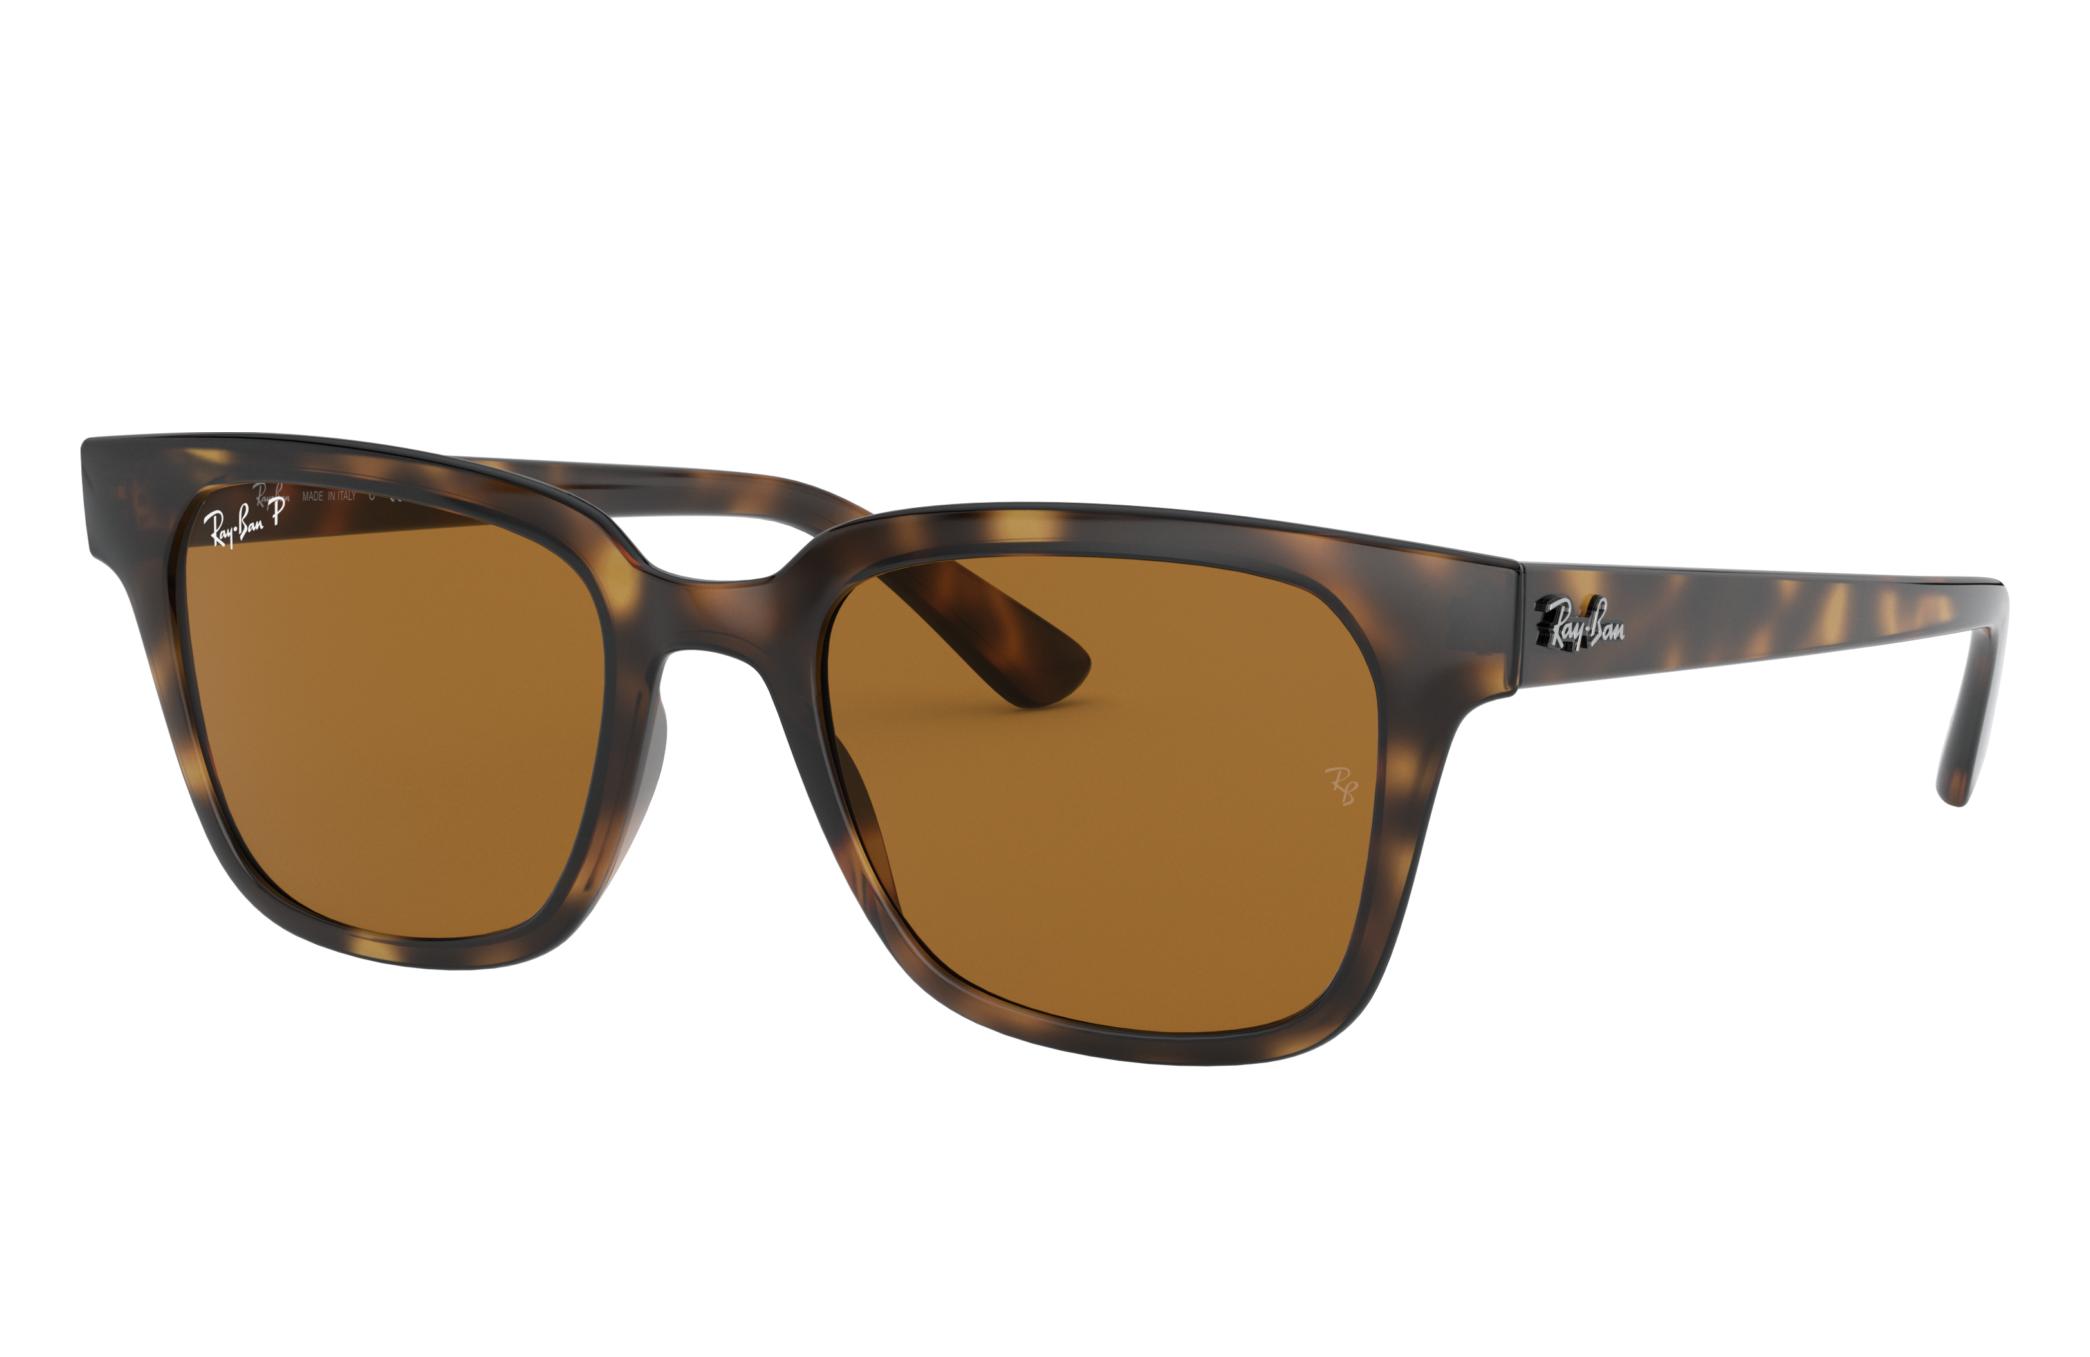 Ray-Ban Rb4323 Low Bridge Fit Tortoise, Polarized Brown Lenses - RB4323F